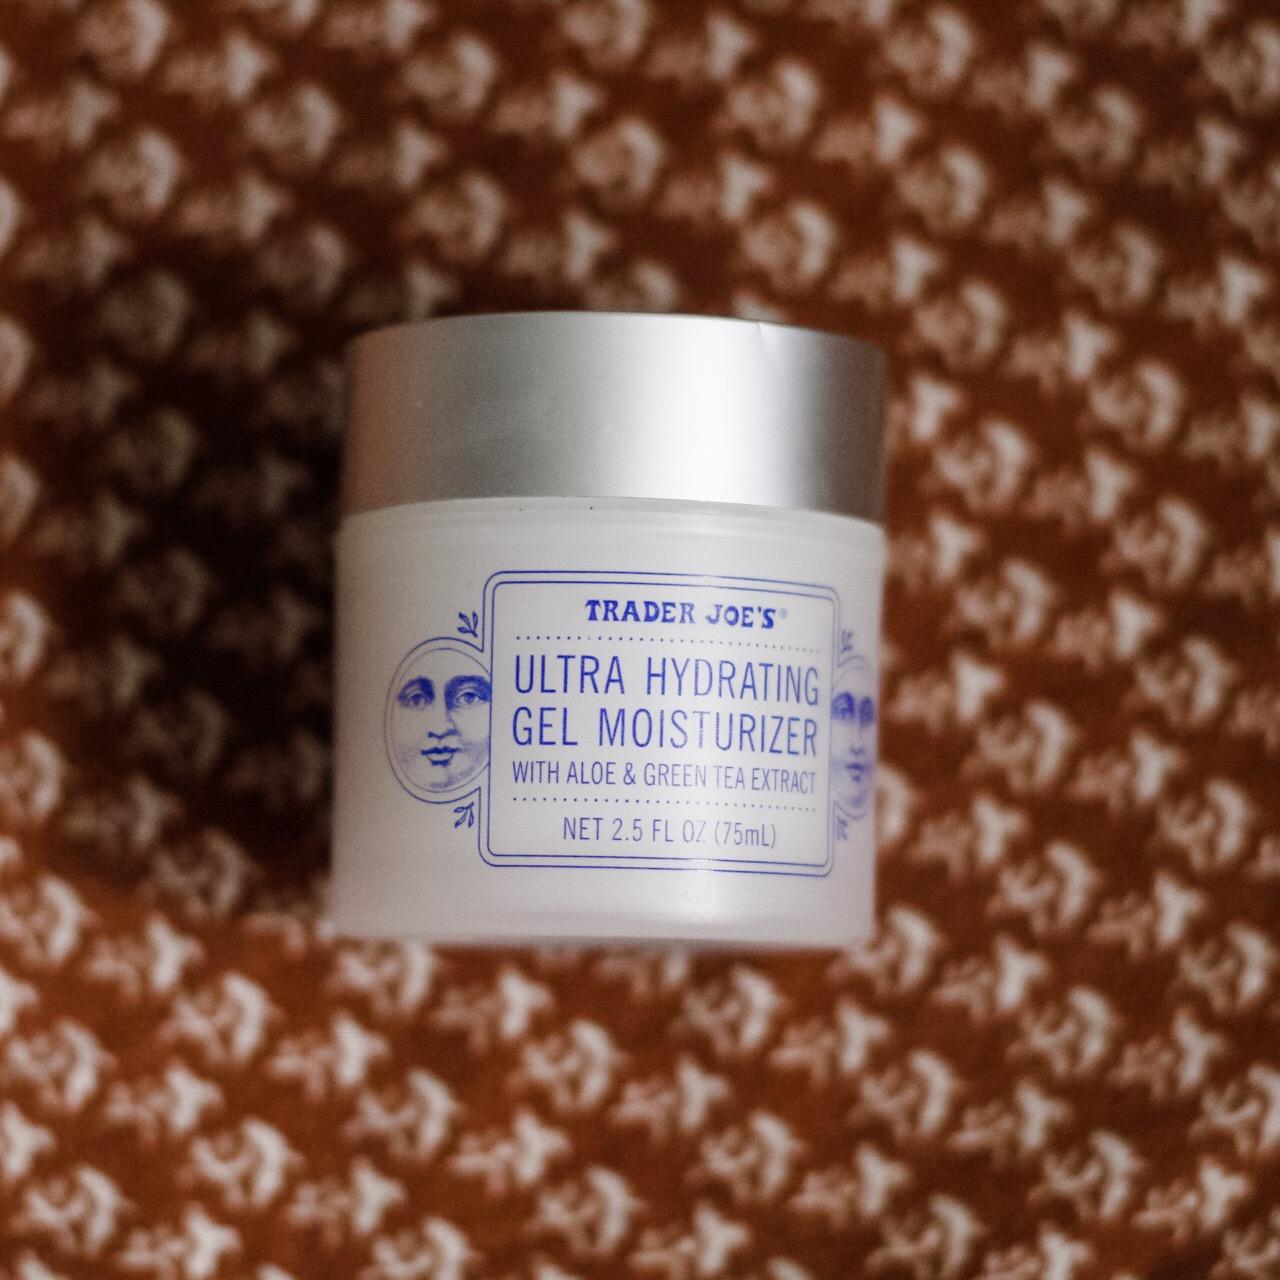 trader joe's gel moisturizer.jpg